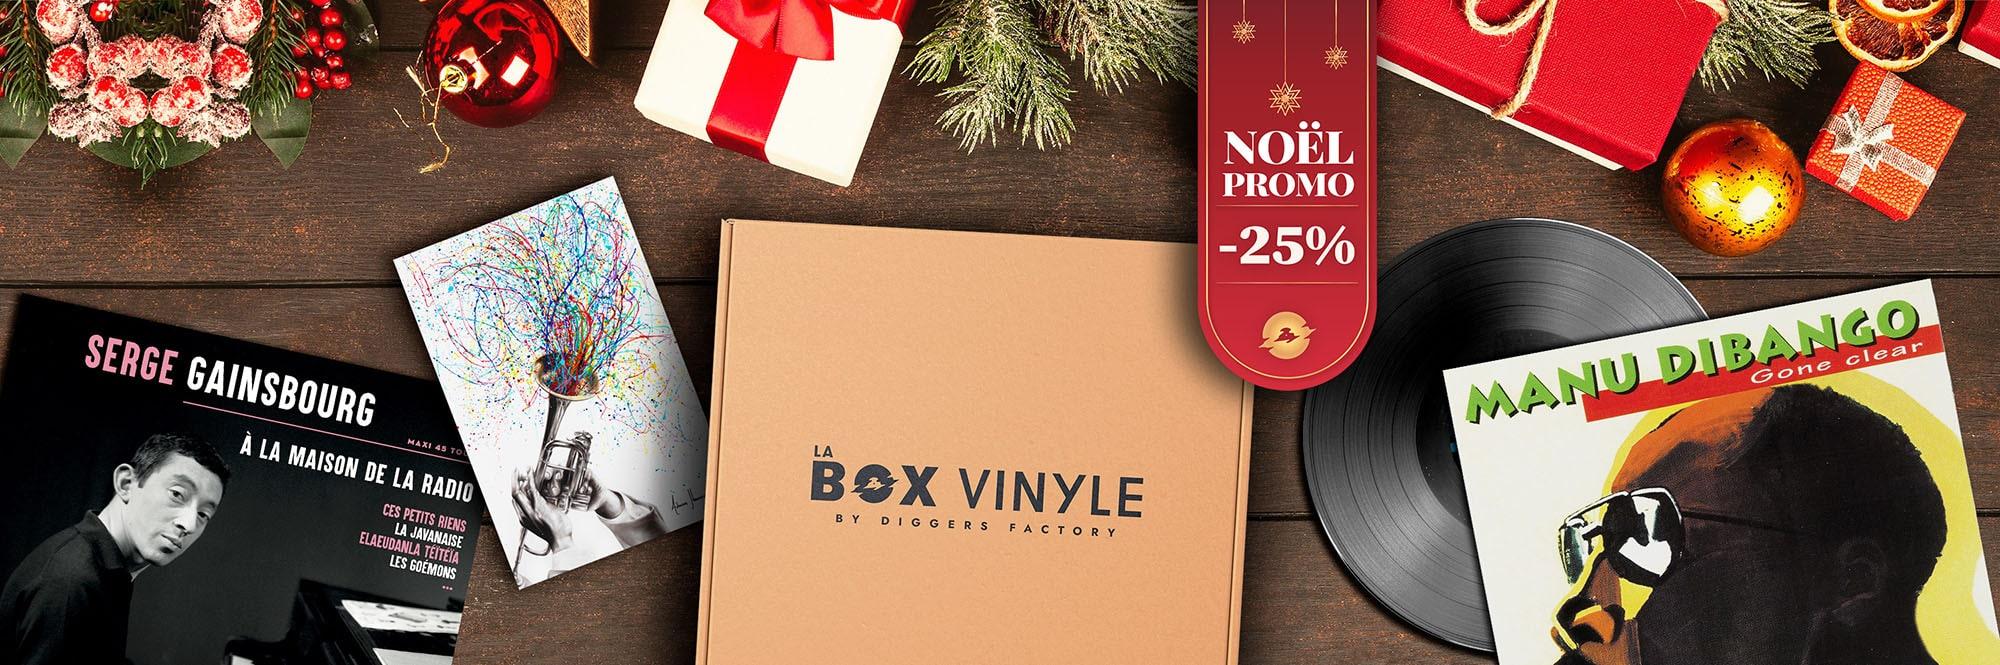 La box vinyle